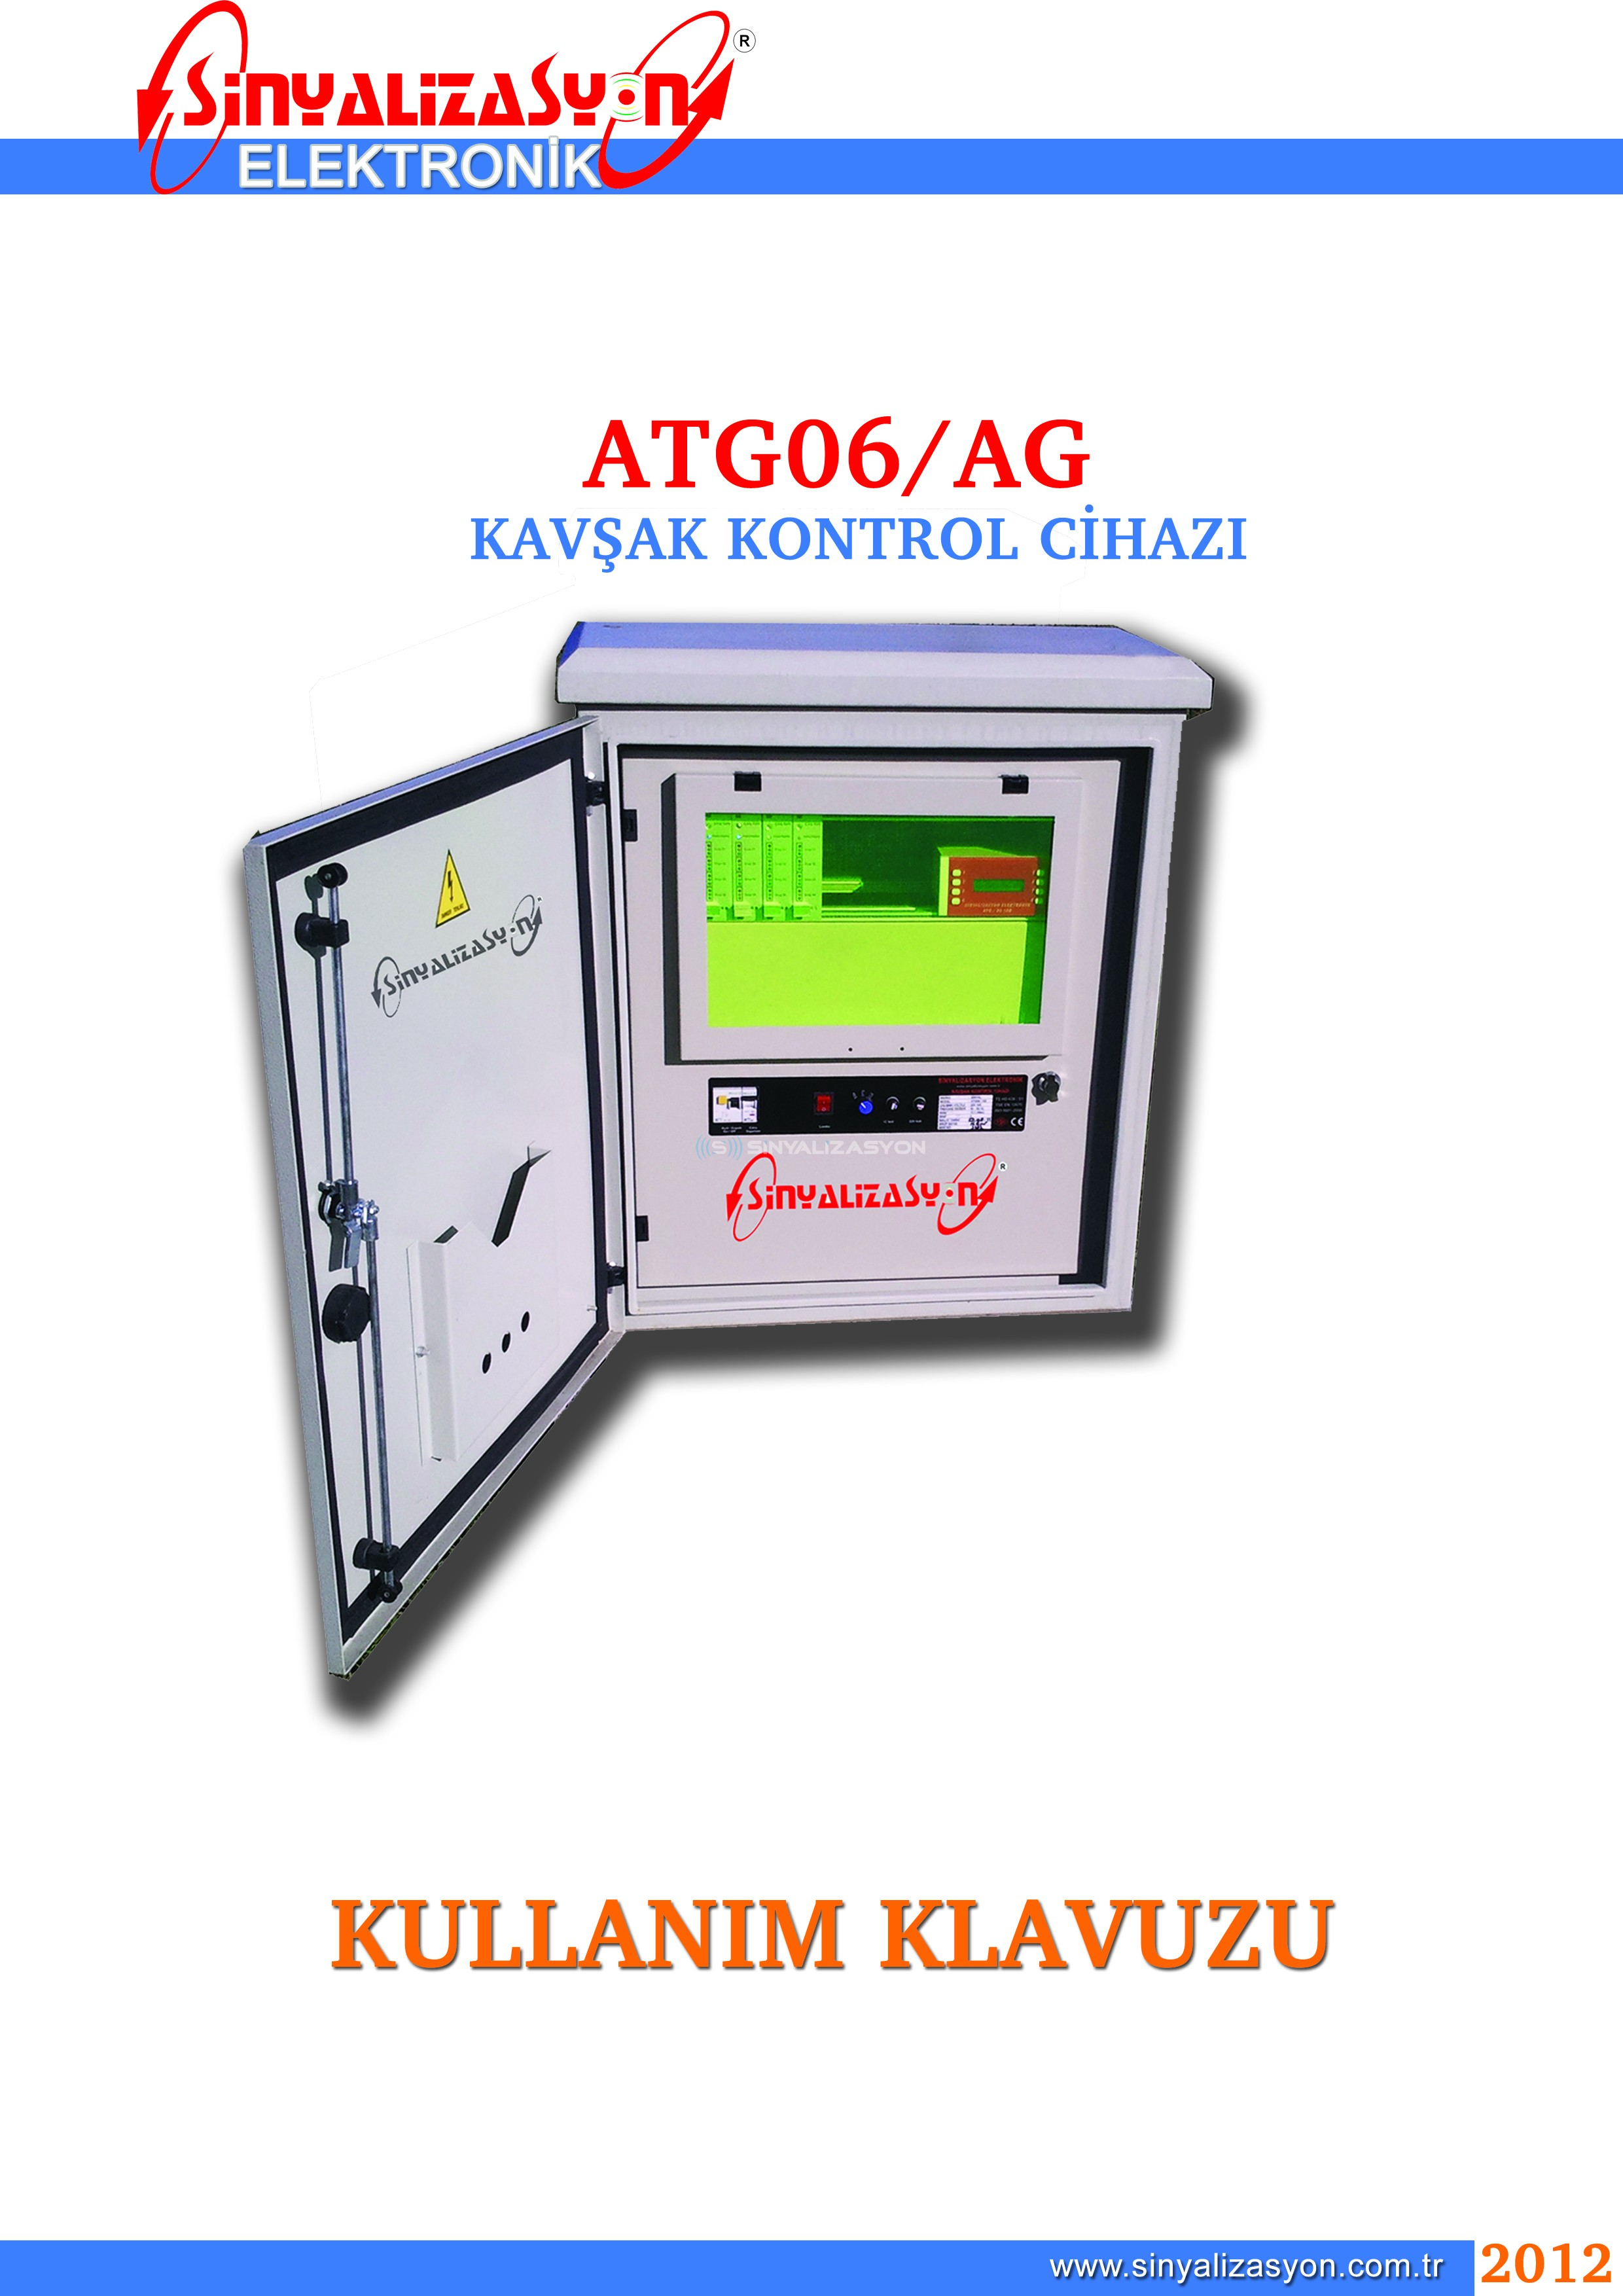 ATG06-AG Kavşak Kontrol Cihazı